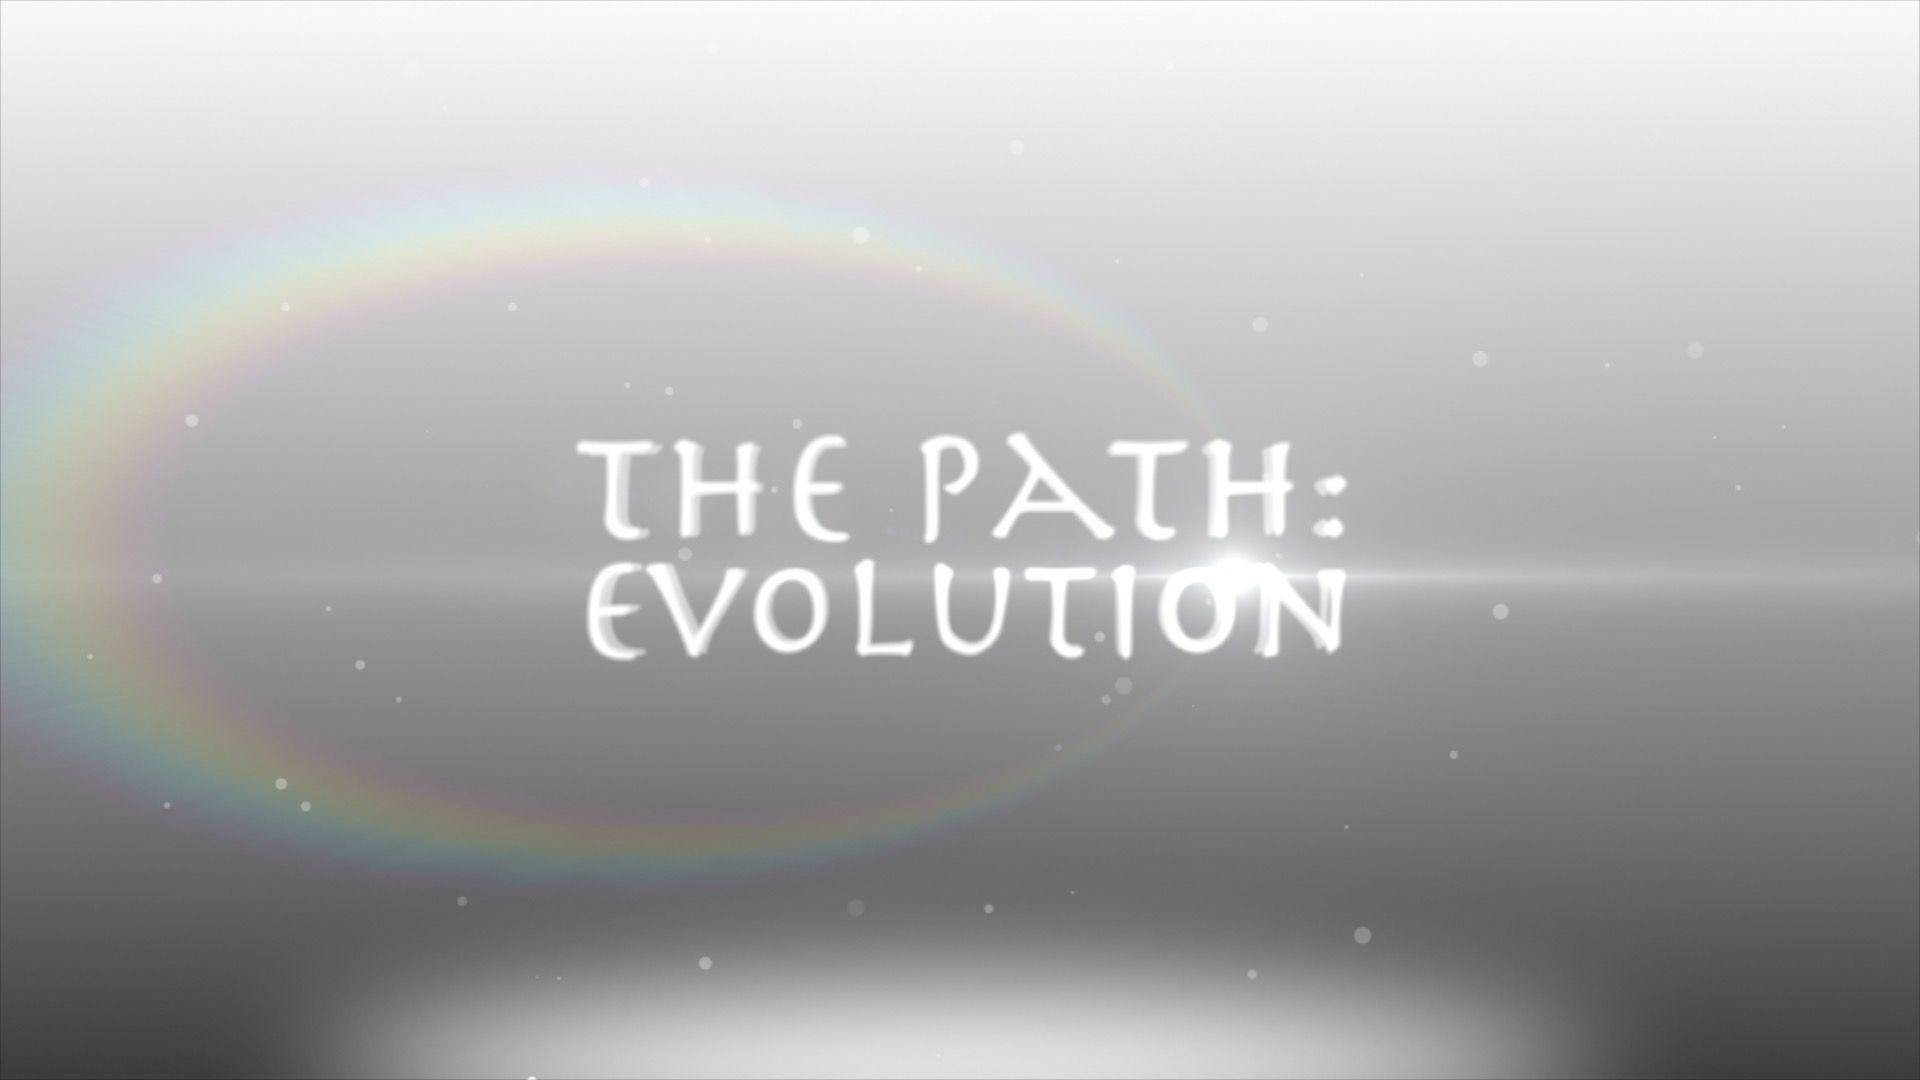 The Path Evolution-Trailer Title Screen